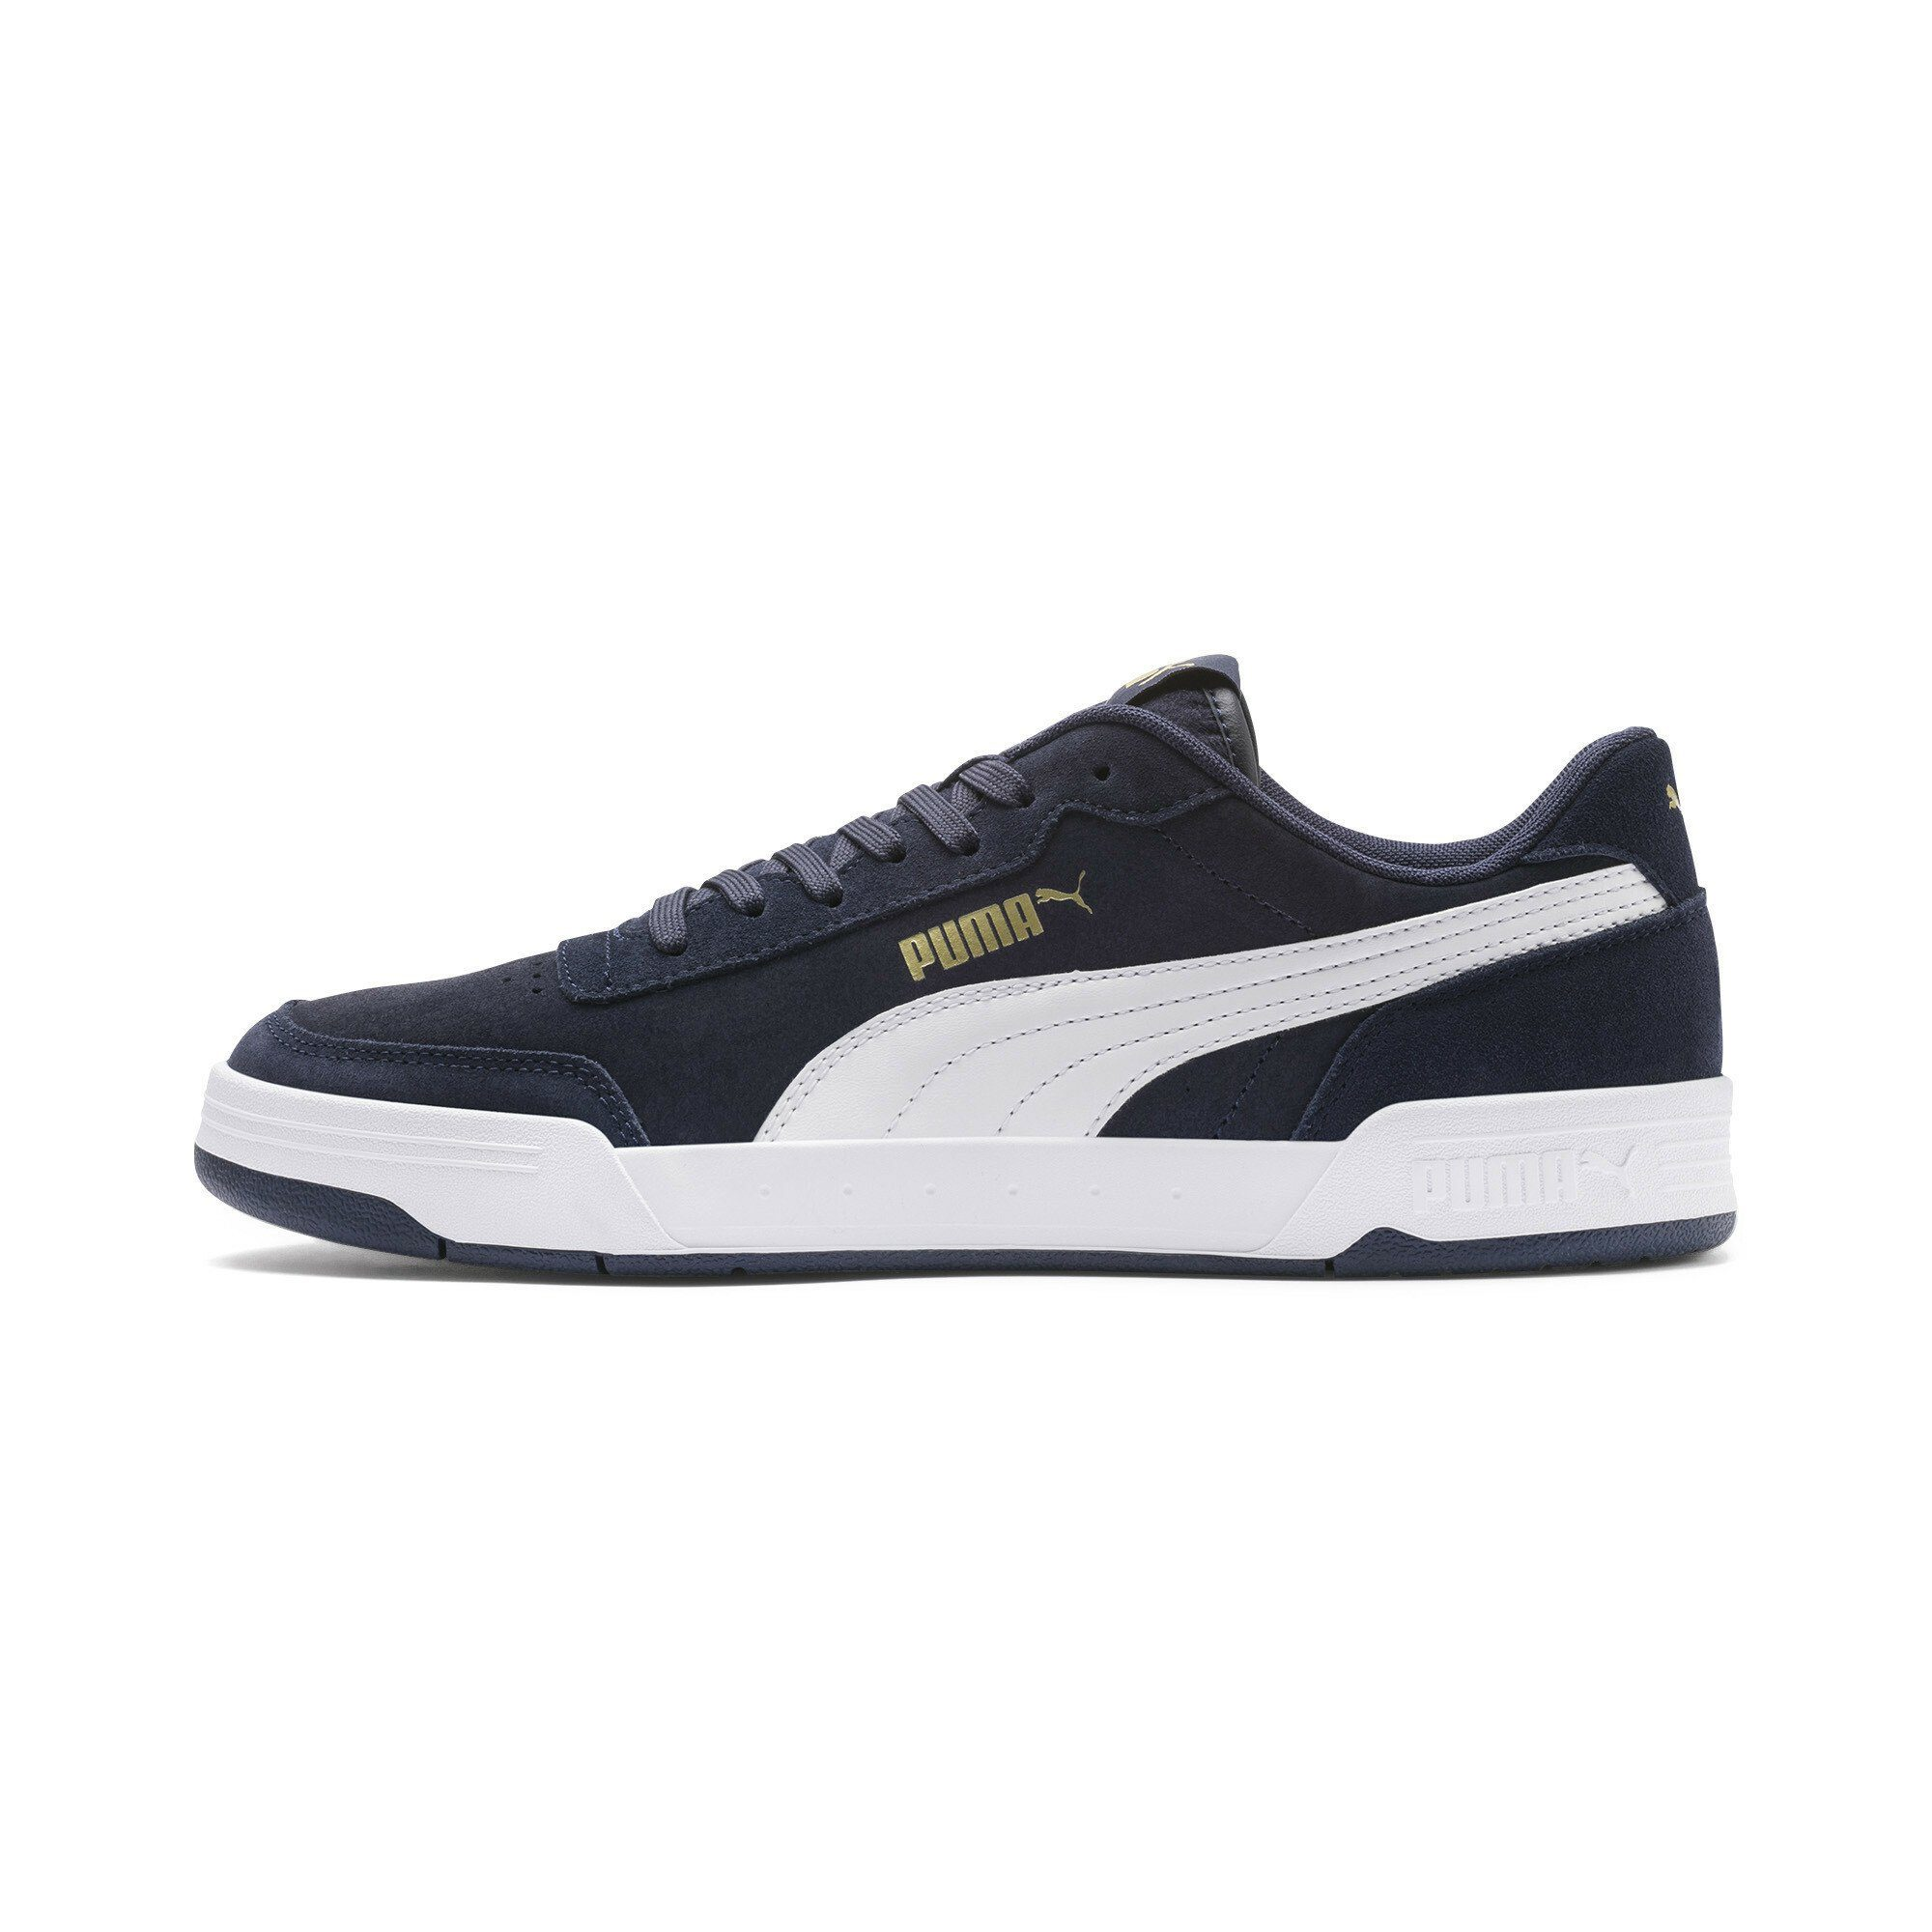 PUMA »Caracal Suede Sneaker« Sneaker online kaufen | OTTO